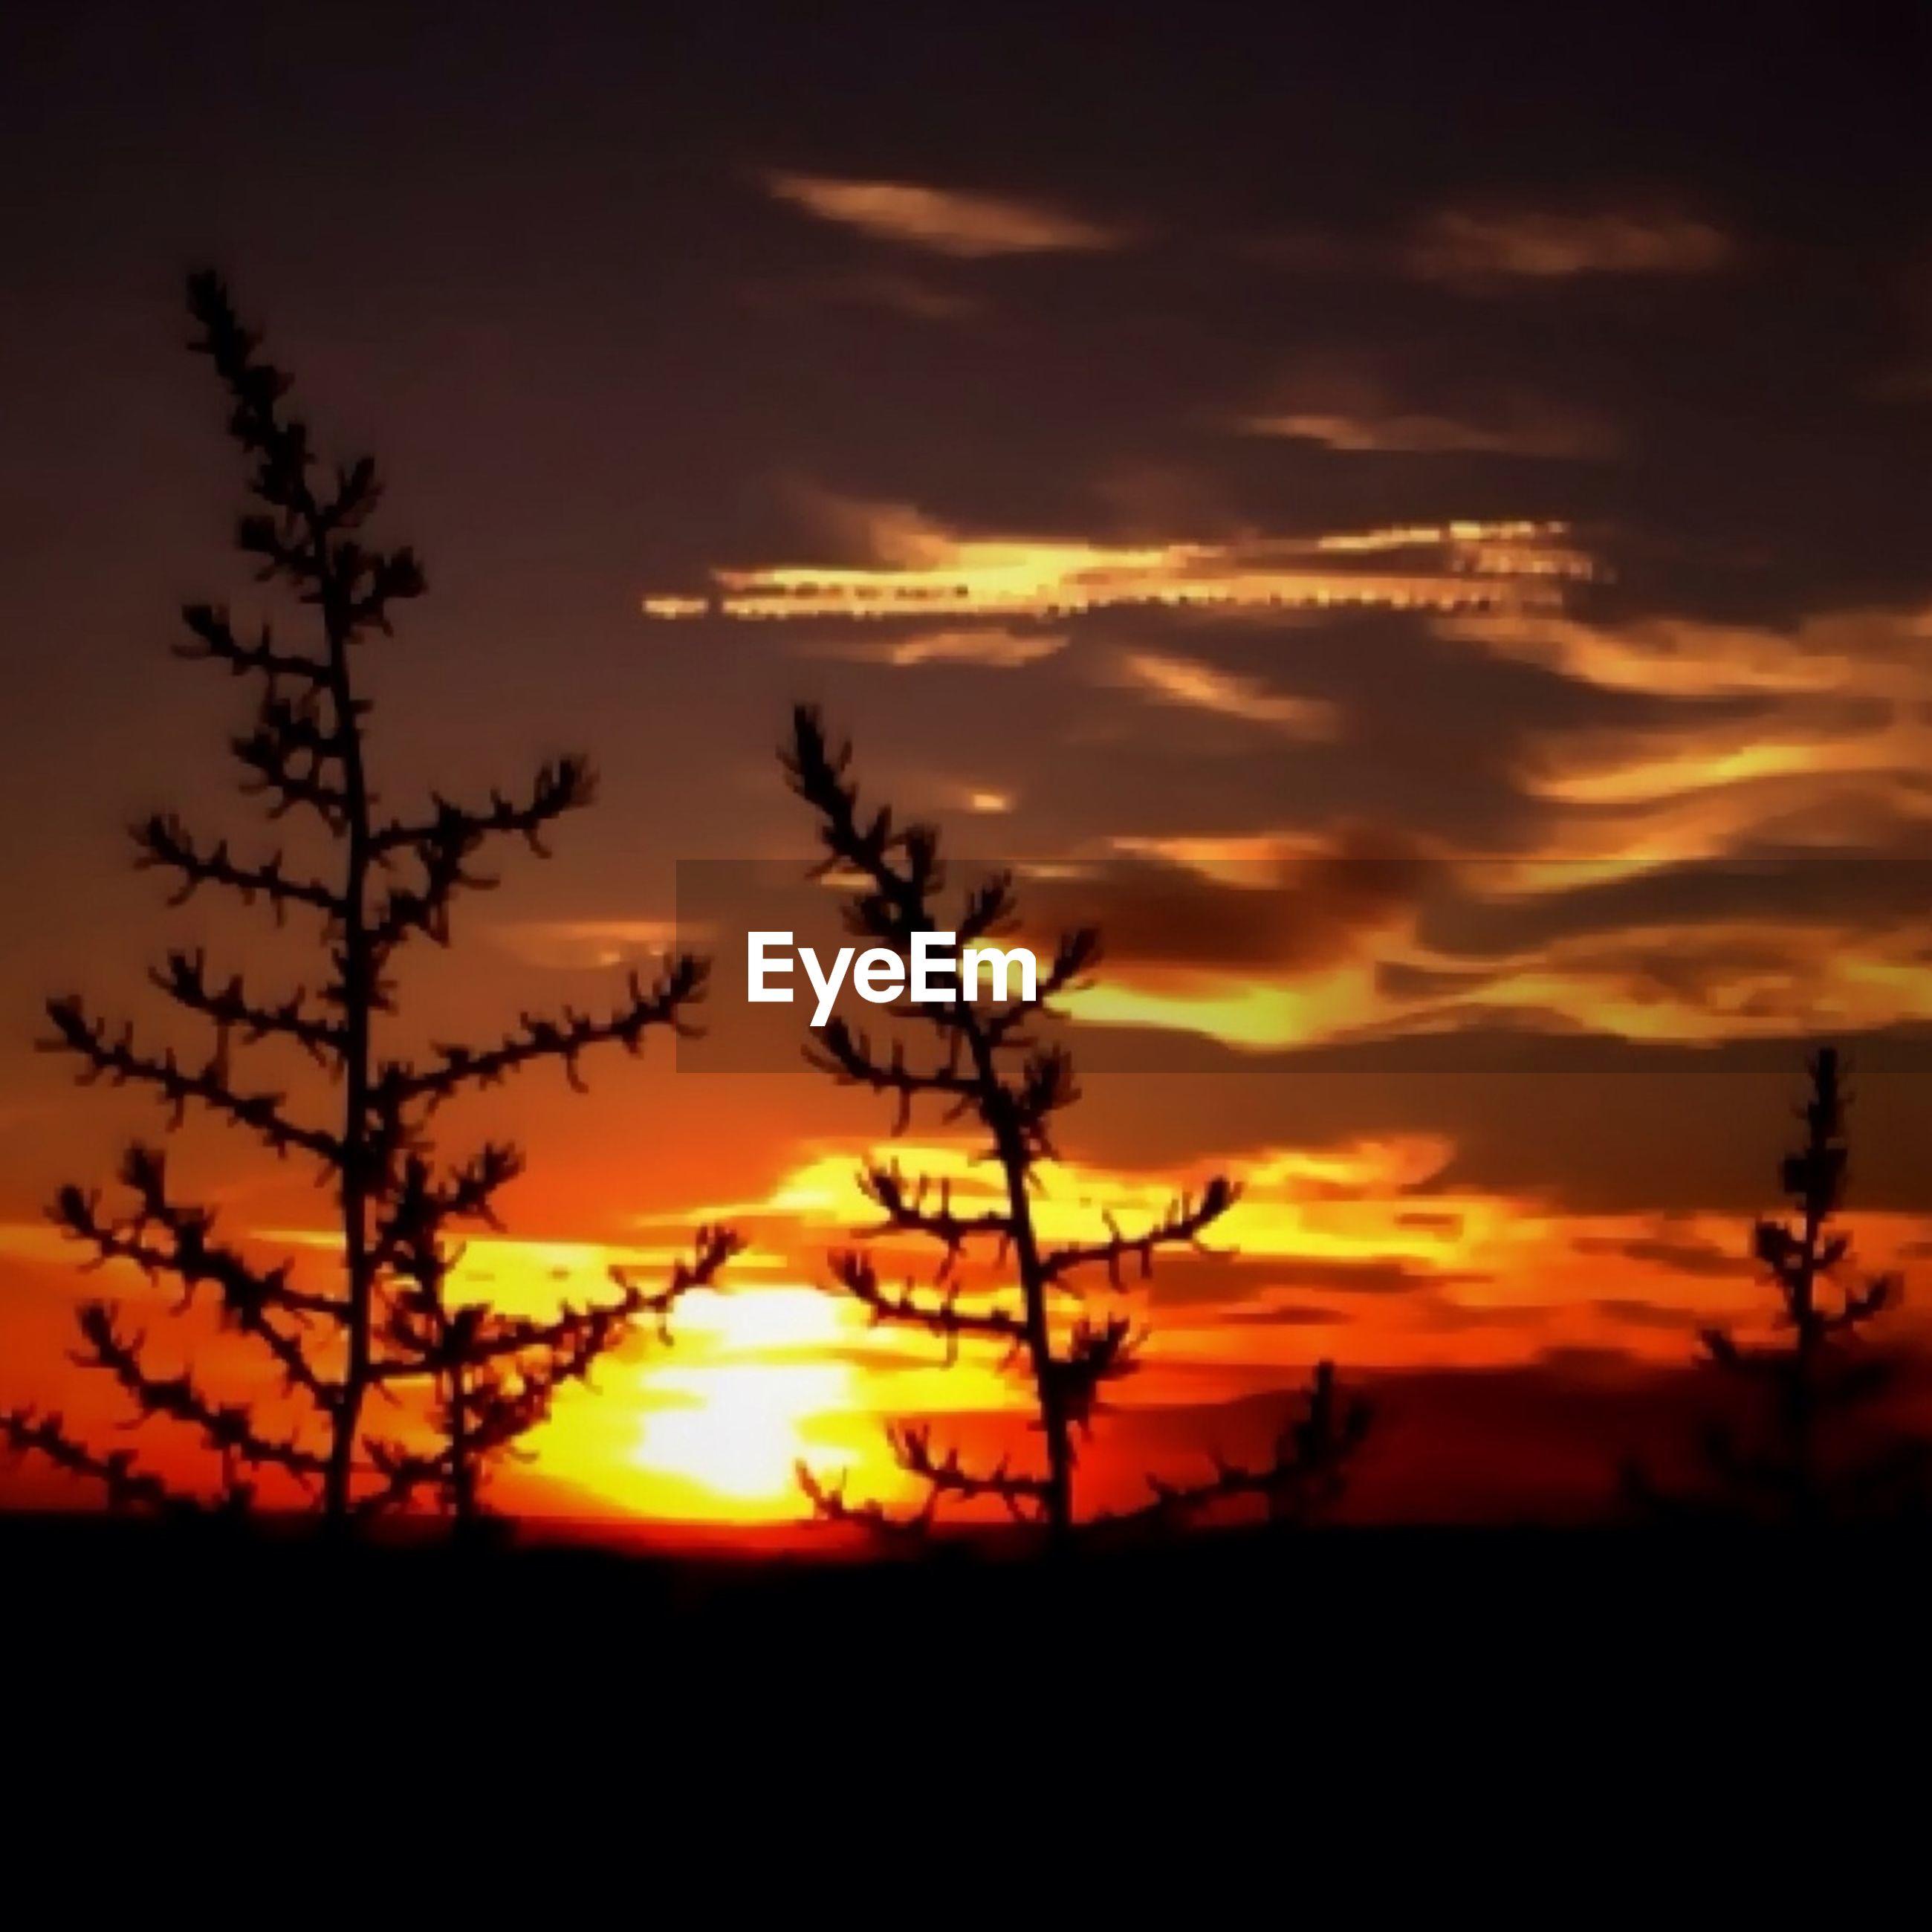 sunset, silhouette, orange color, sky, beauty in nature, scenics, tranquil scene, sun, tranquility, nature, idyllic, landscape, cloud - sky, dramatic sky, cloud, plant, field, growth, majestic, tree